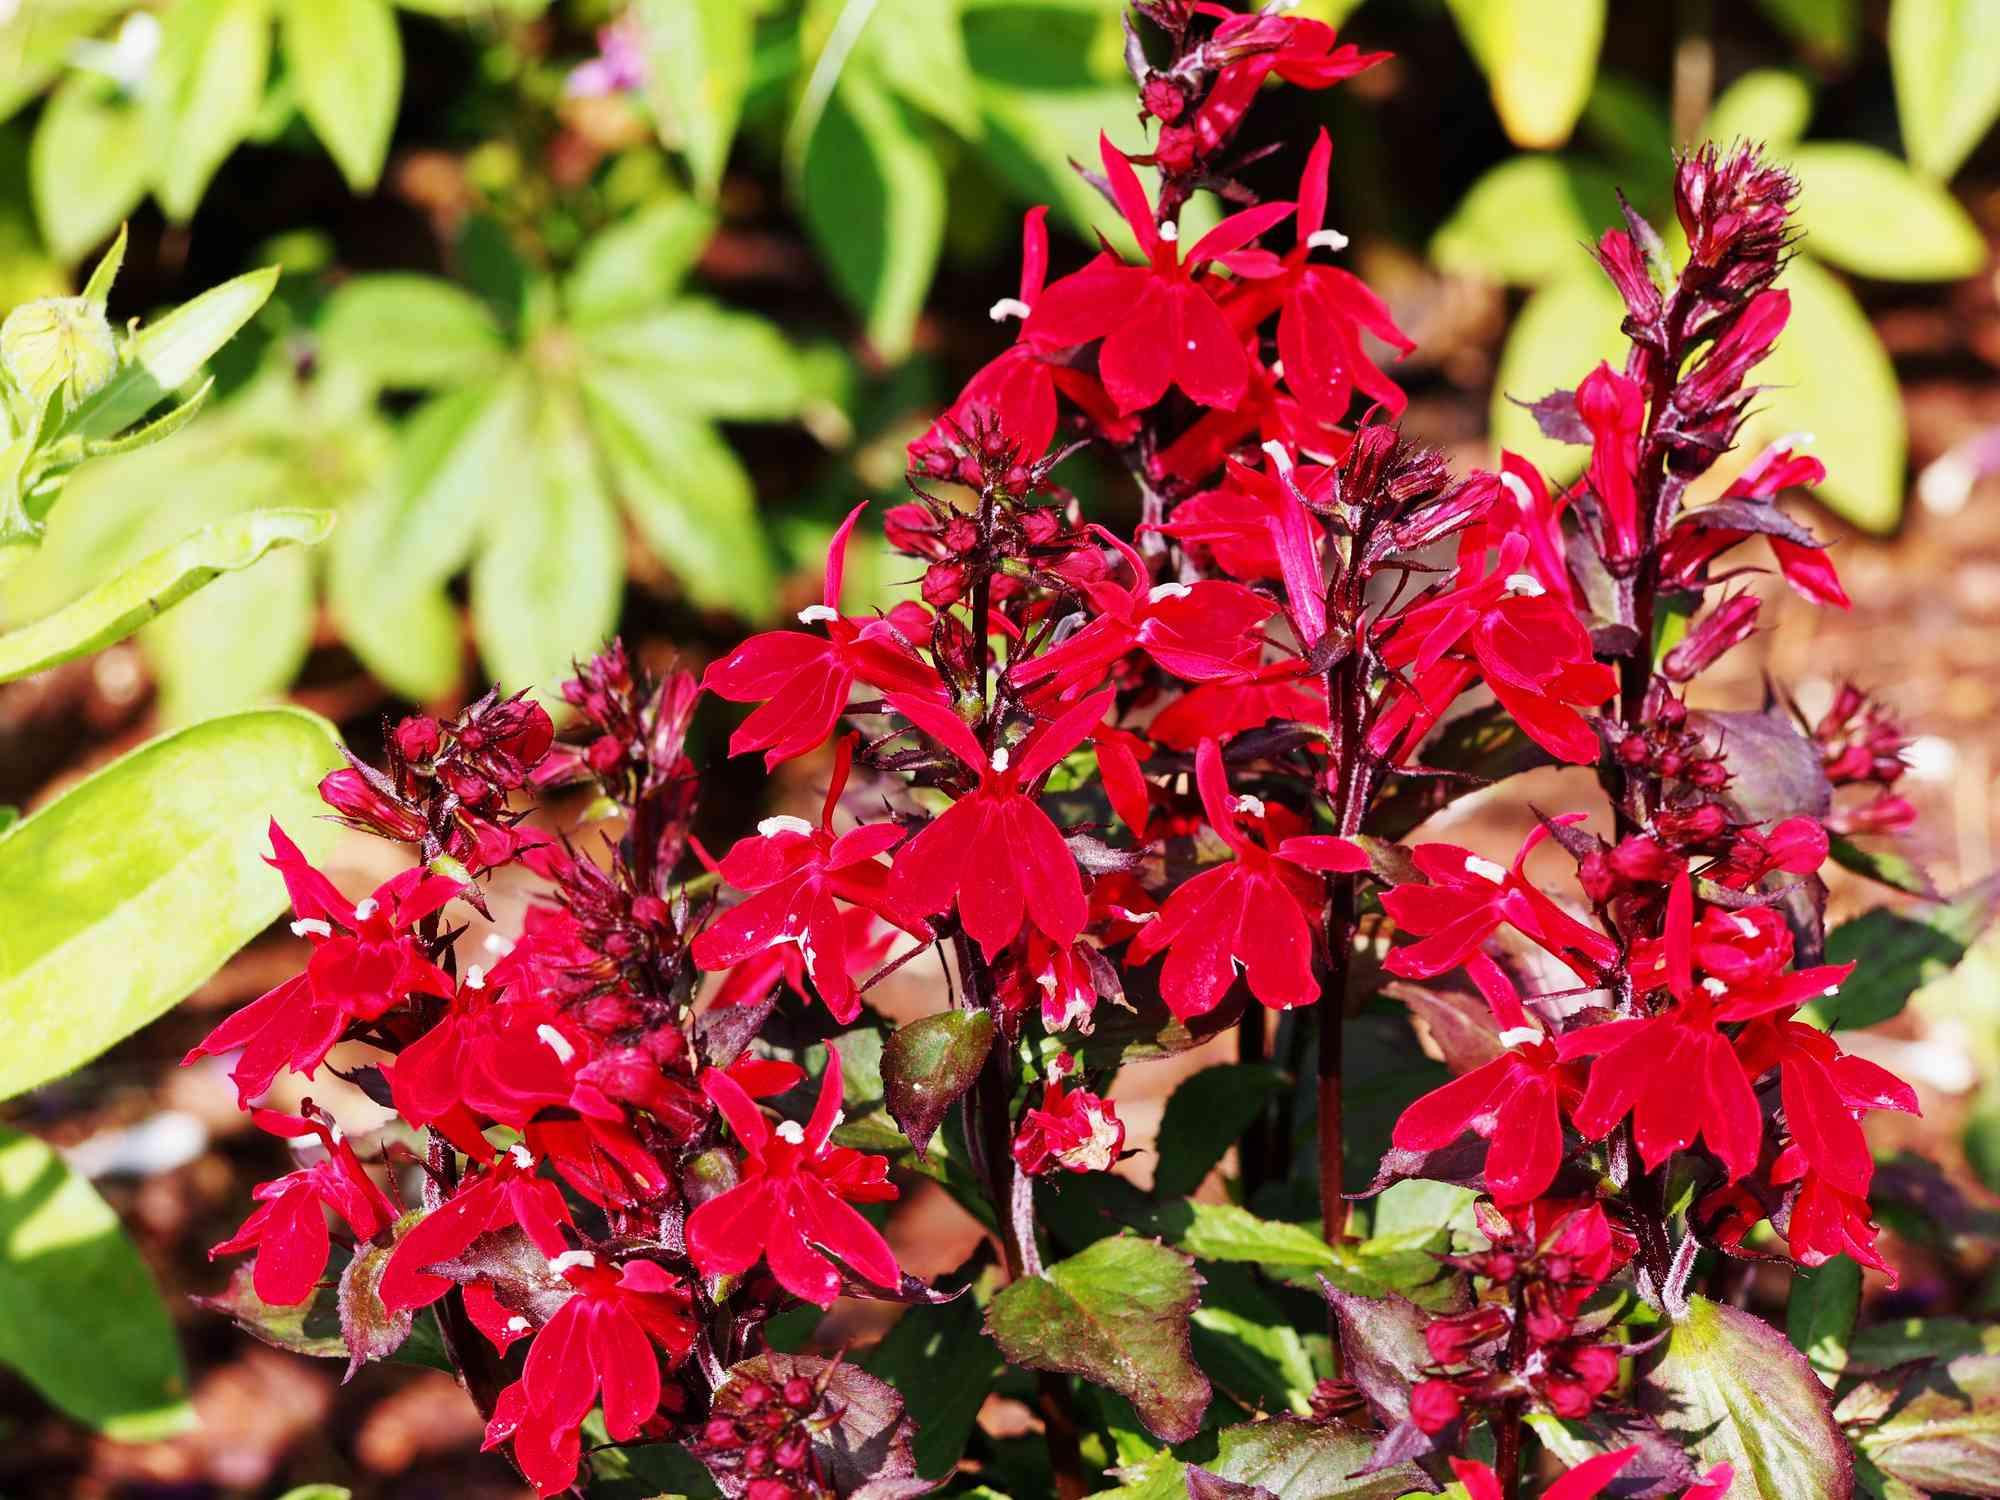 Cardinal flower in bloom